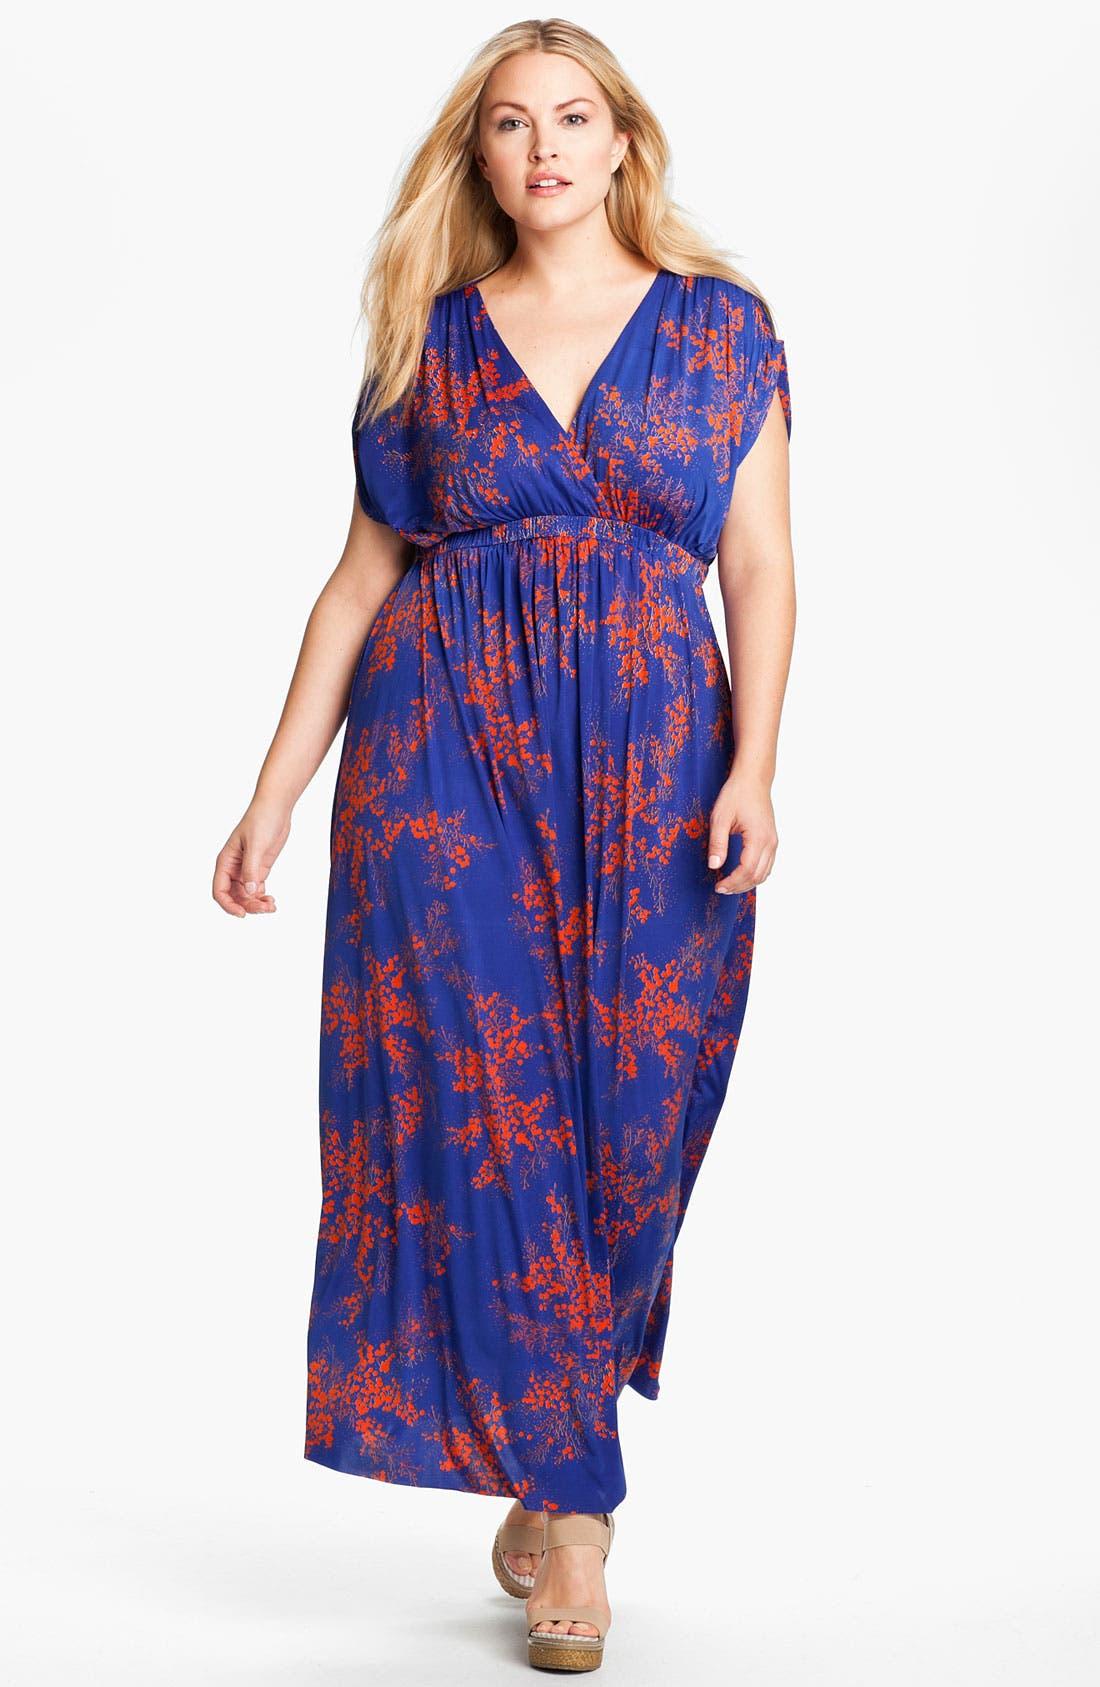 Main Image - Tbags Los Angeles Surplice Knit Maxi Dress (Plus)